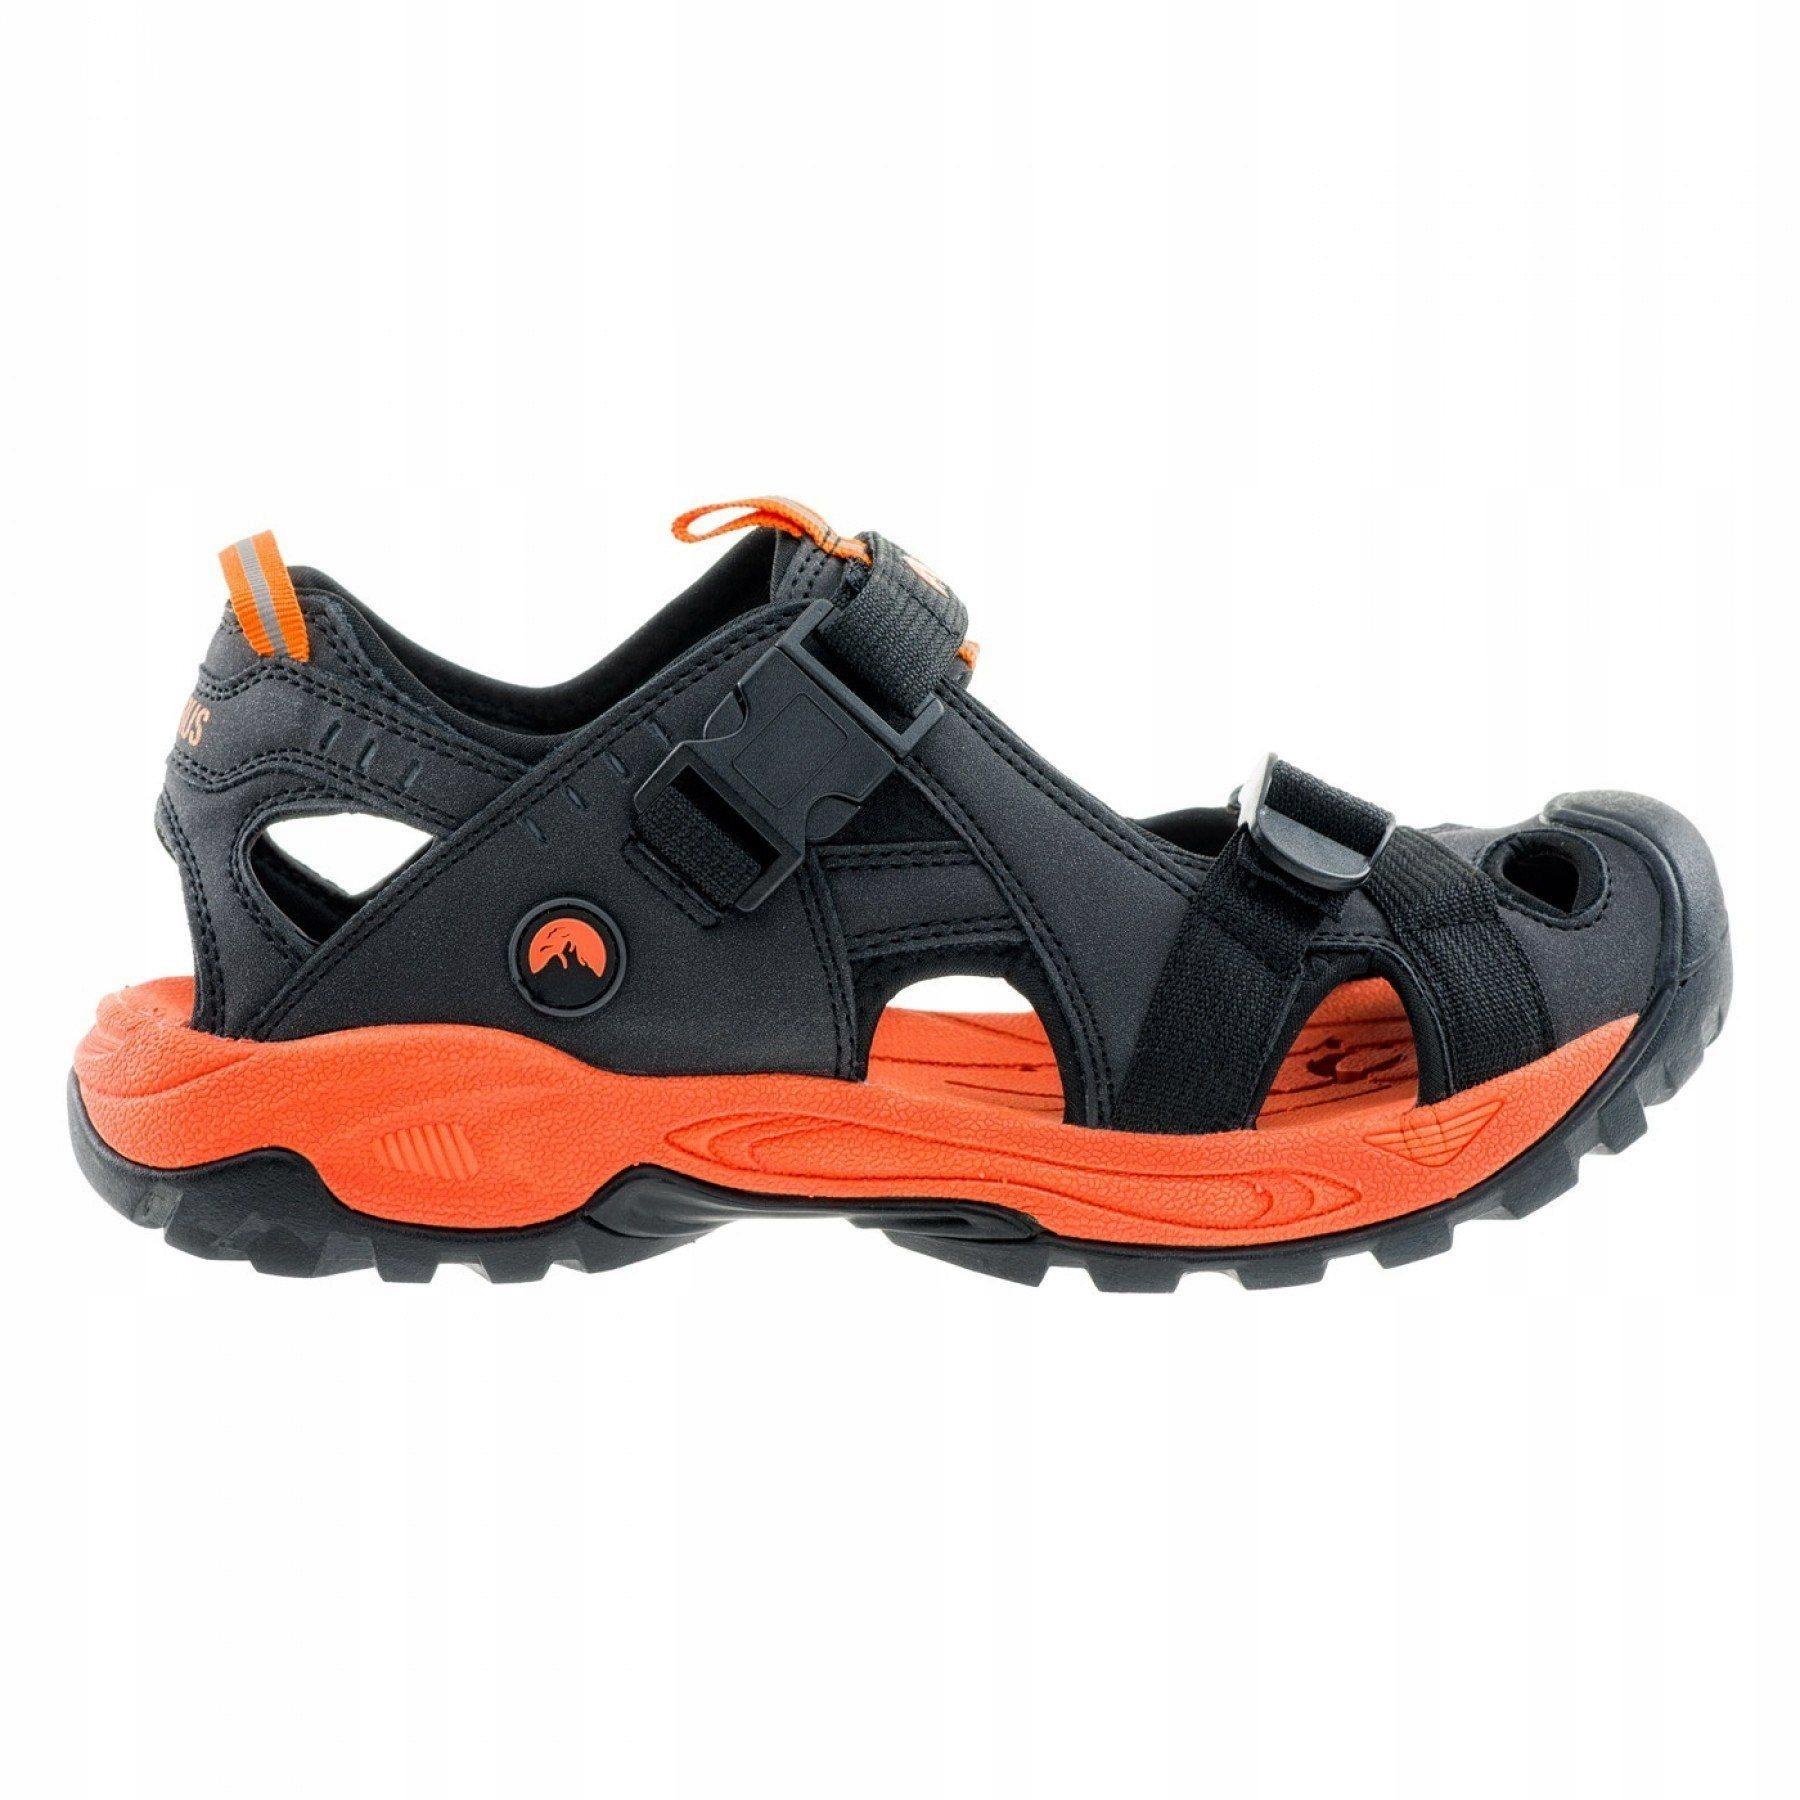 Sandały męskie - Elbrus Gatsen Black/ Orange r. 45